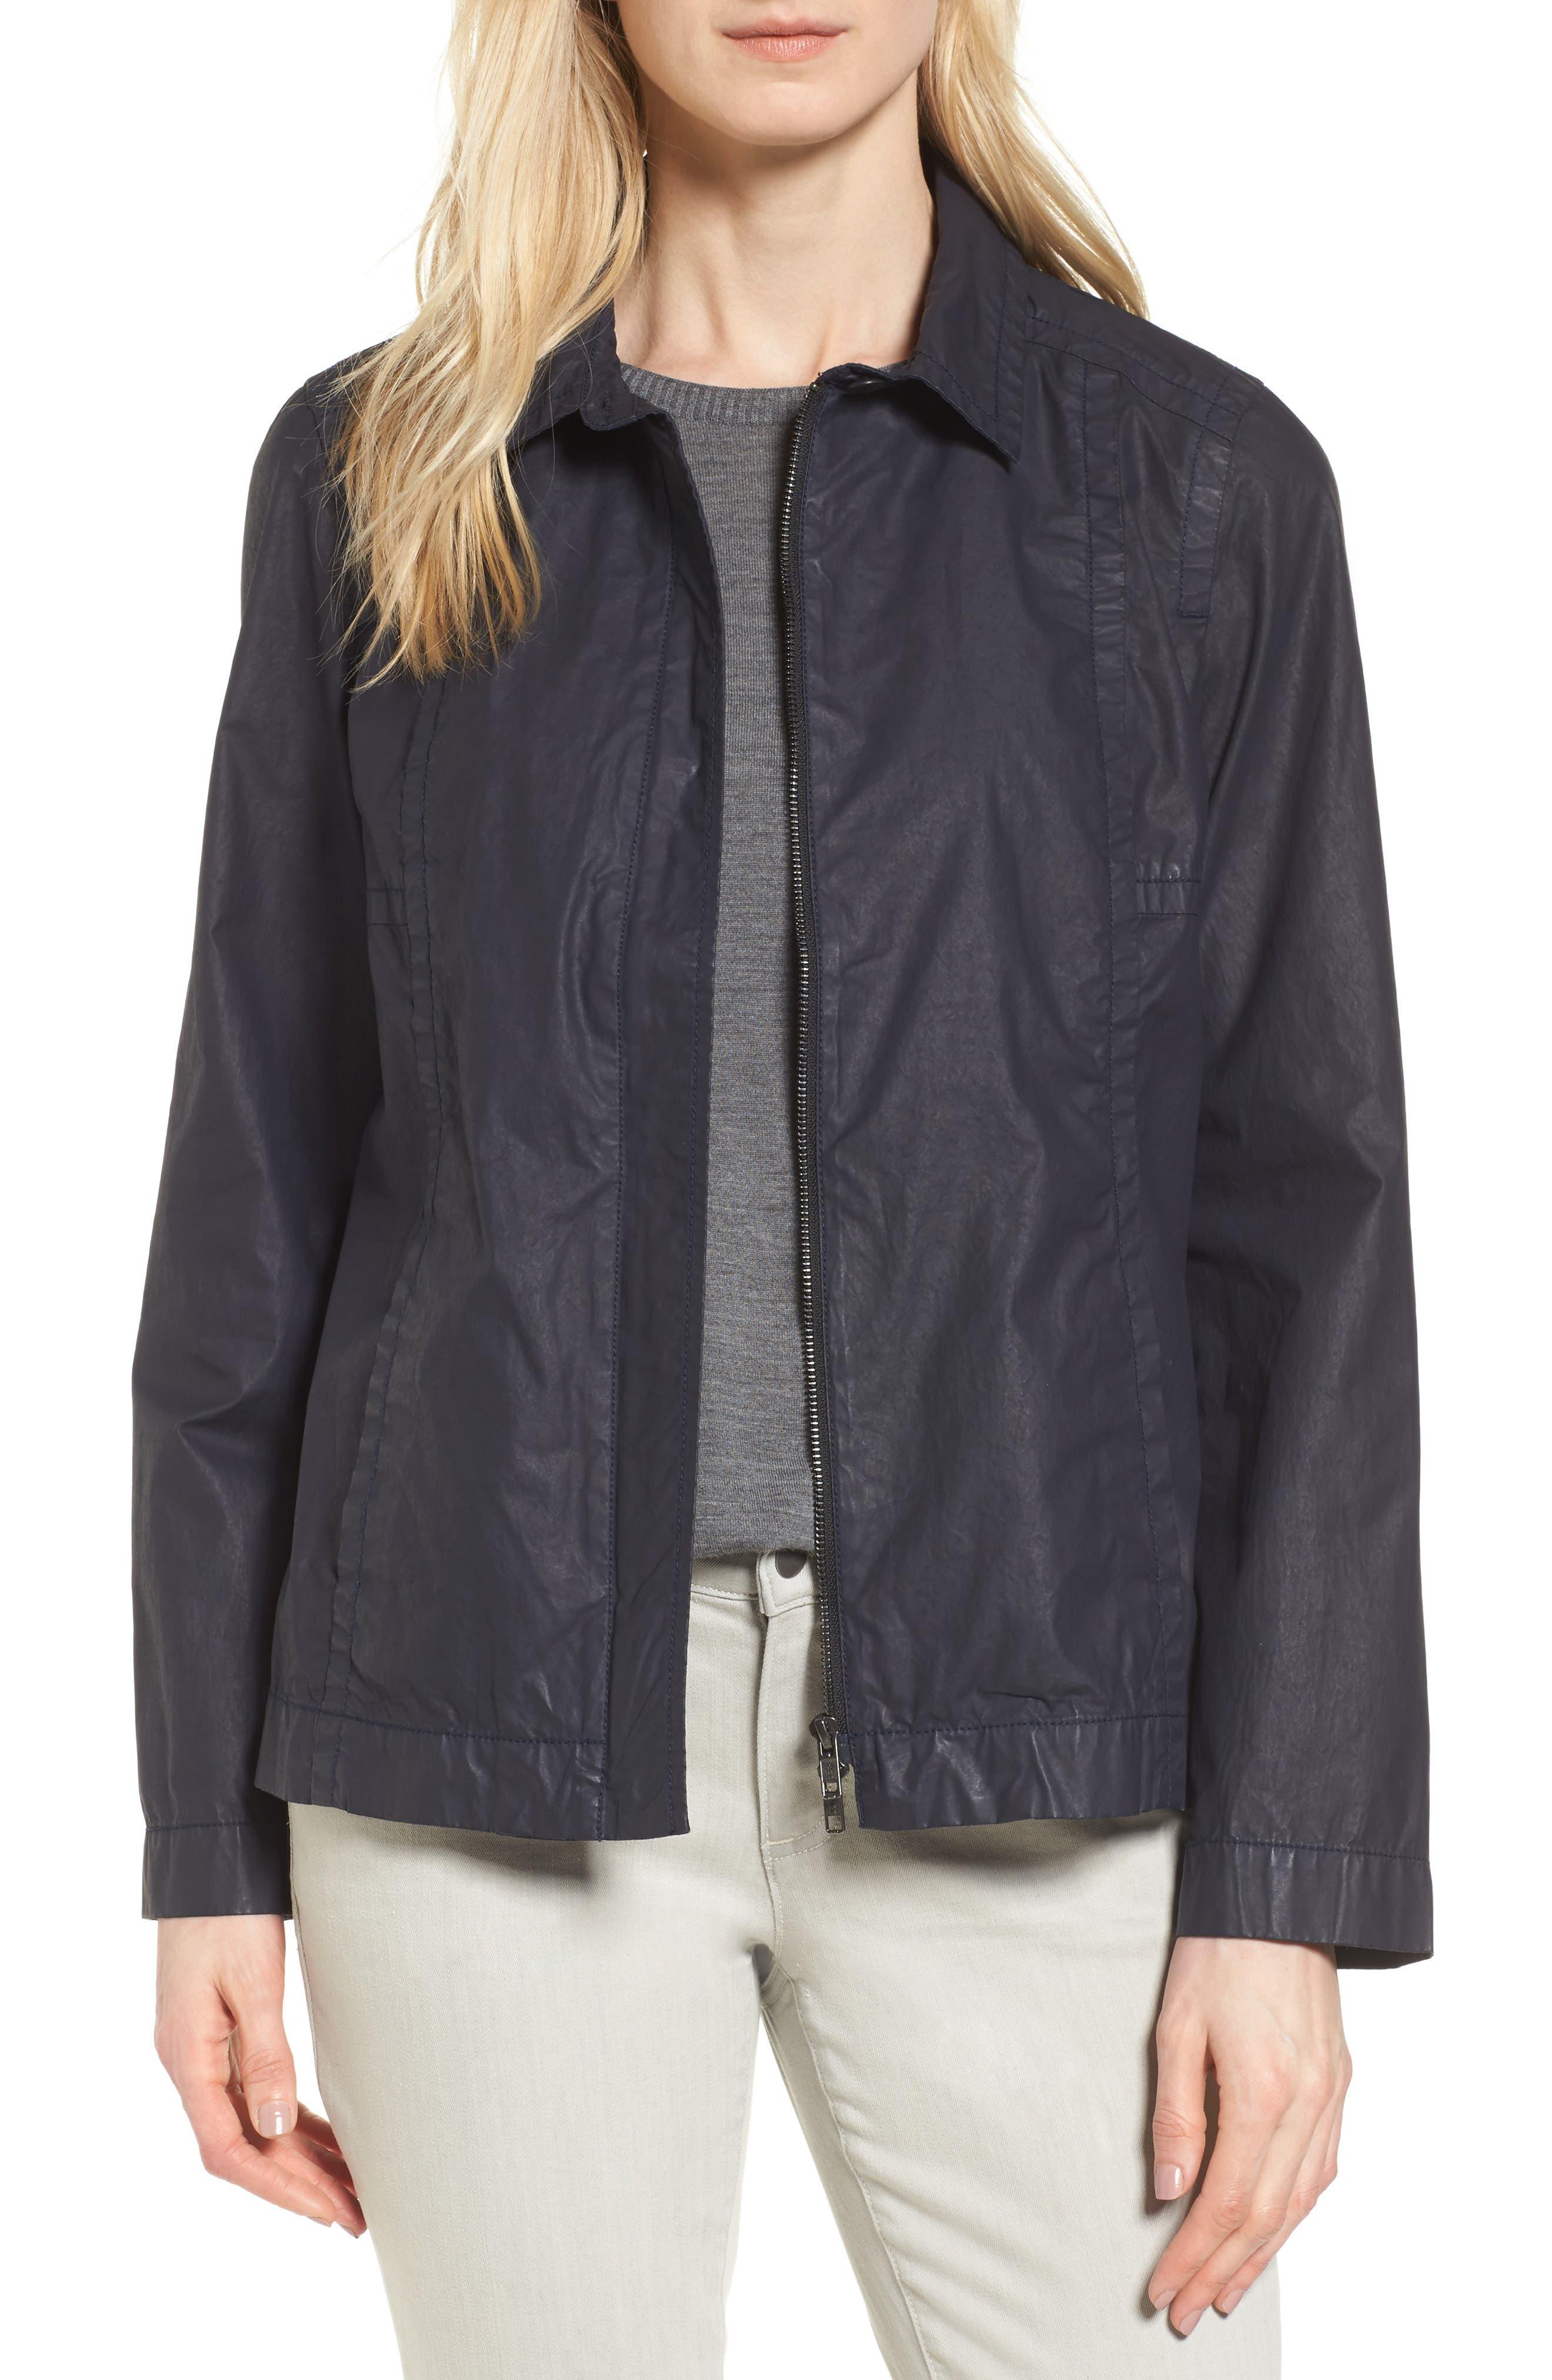 Eileen Fisher Waxed Cotton Swing Jacket (Regular & Petite)